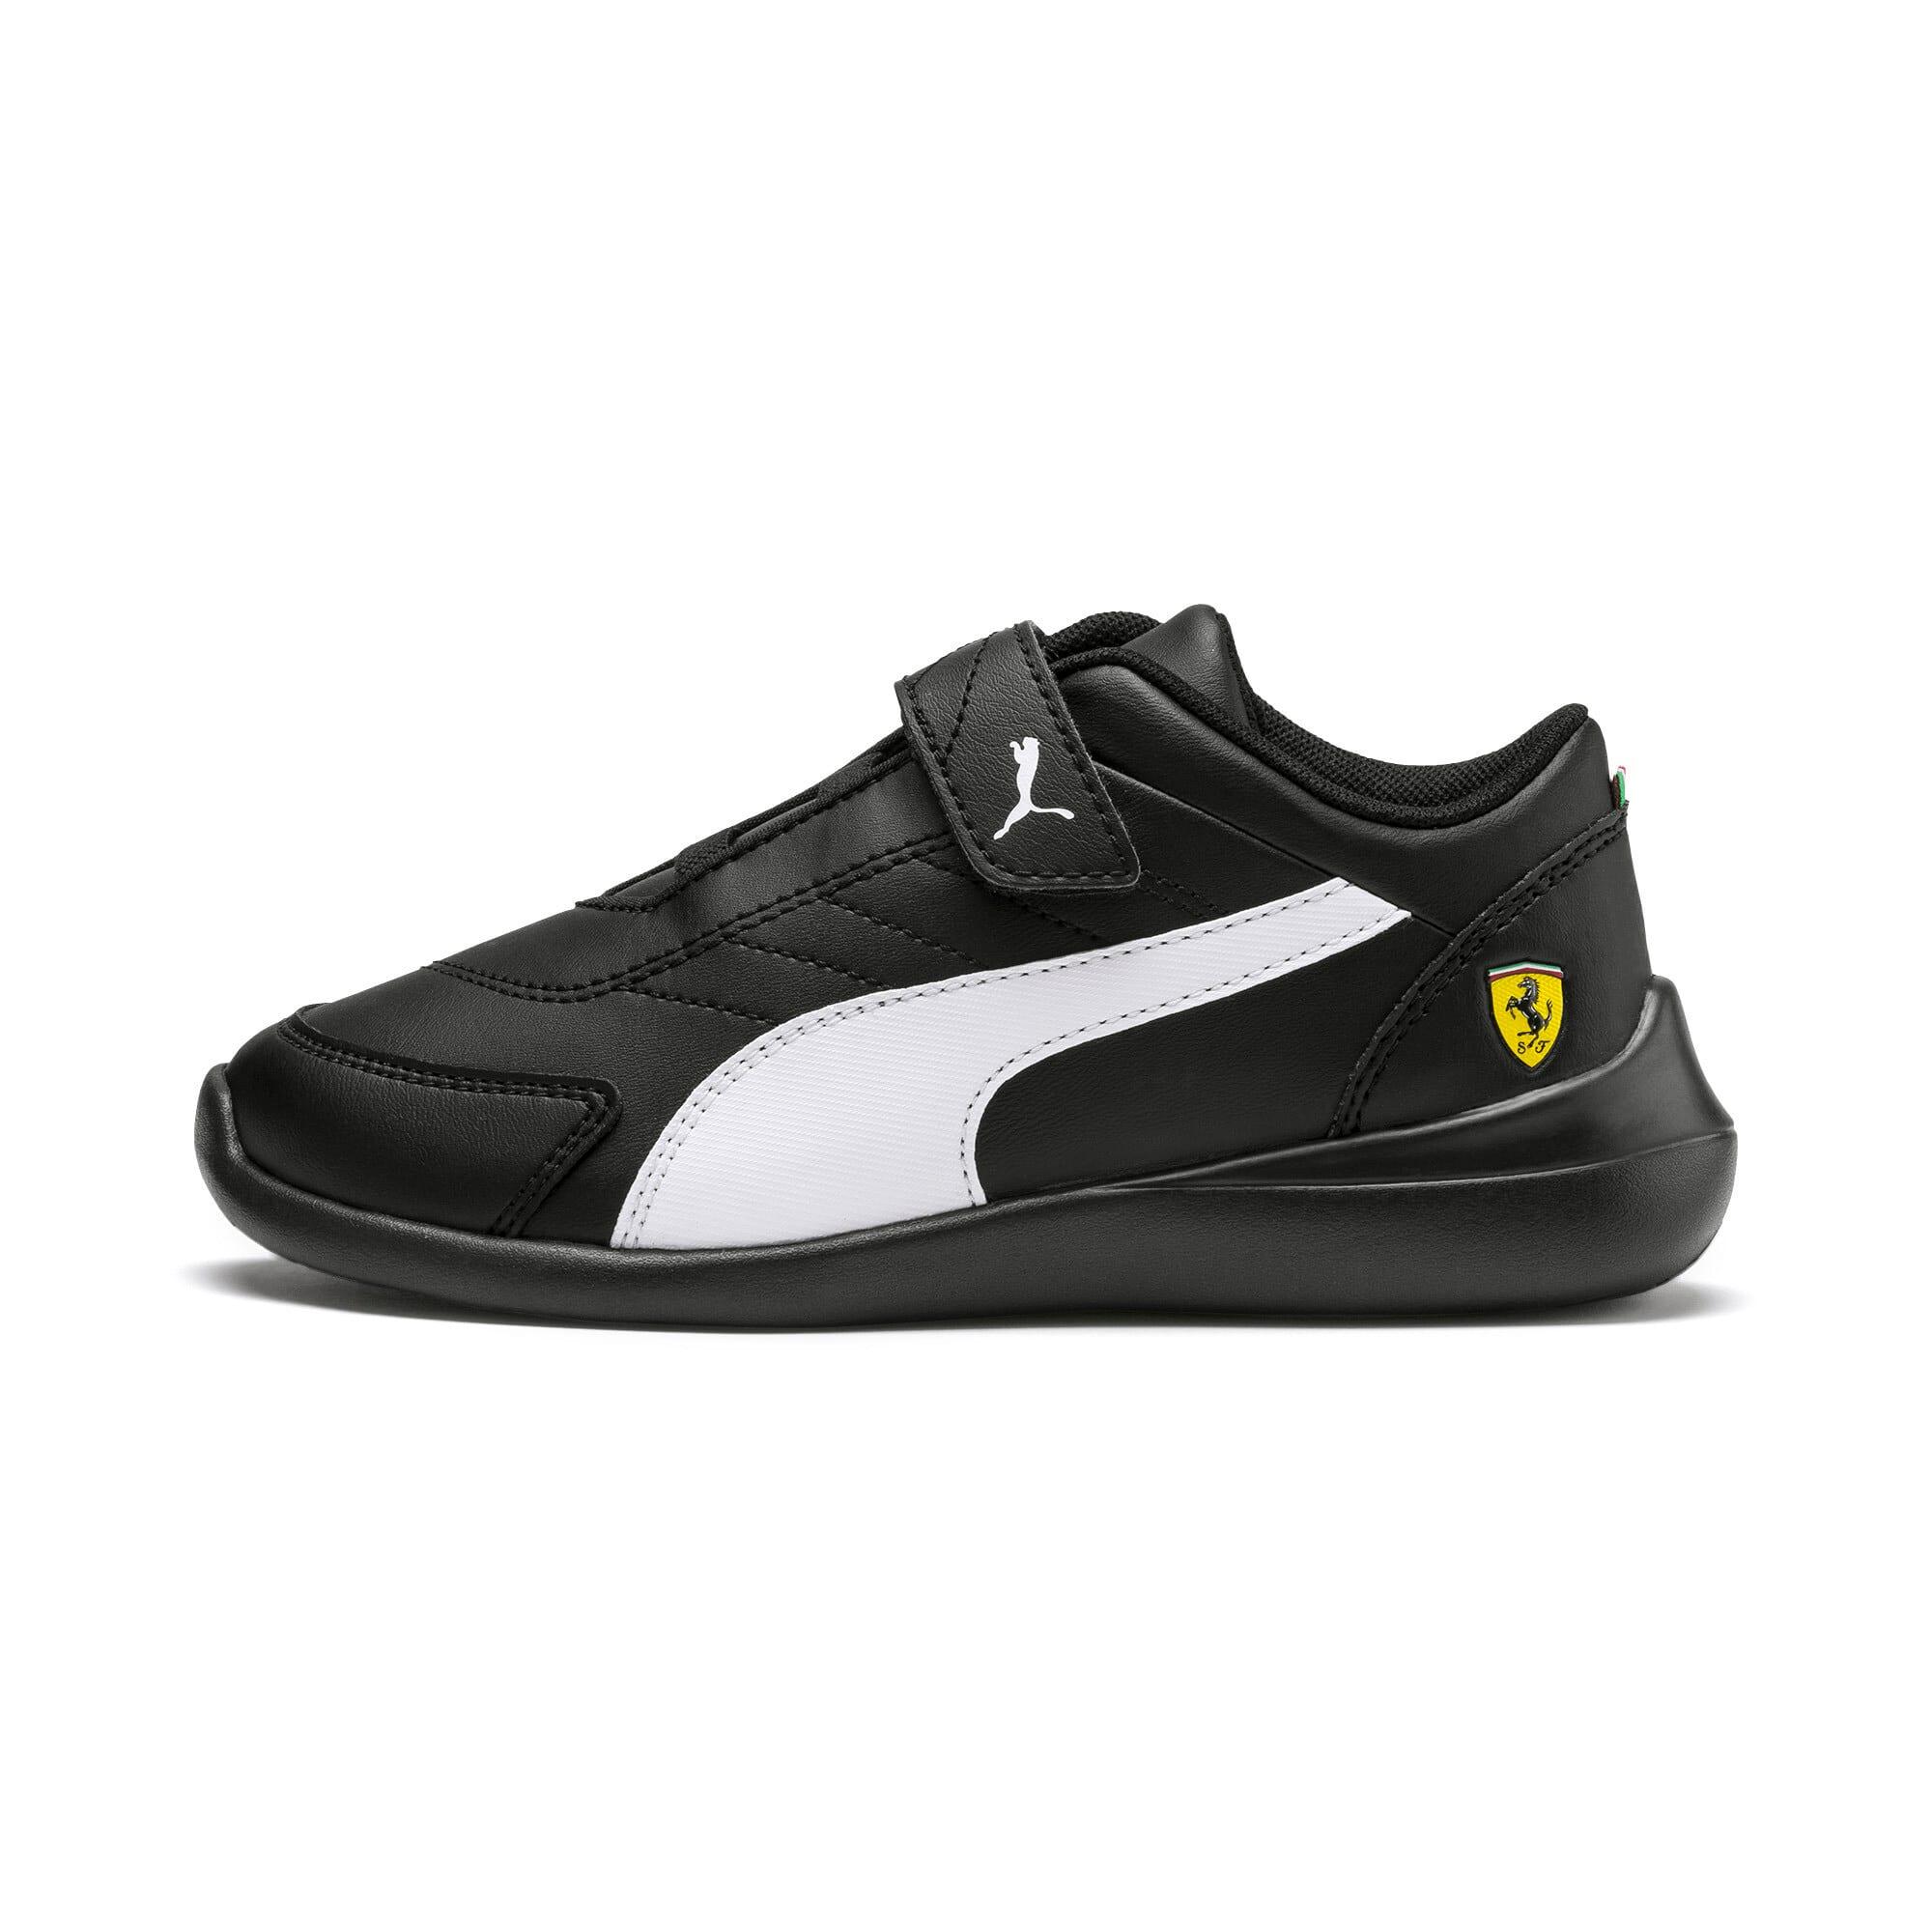 Thumbnail 1 of Scuderia Ferrari Kart Cat III Little Kids' Shoes, Black-White-Blazing Yellow, medium